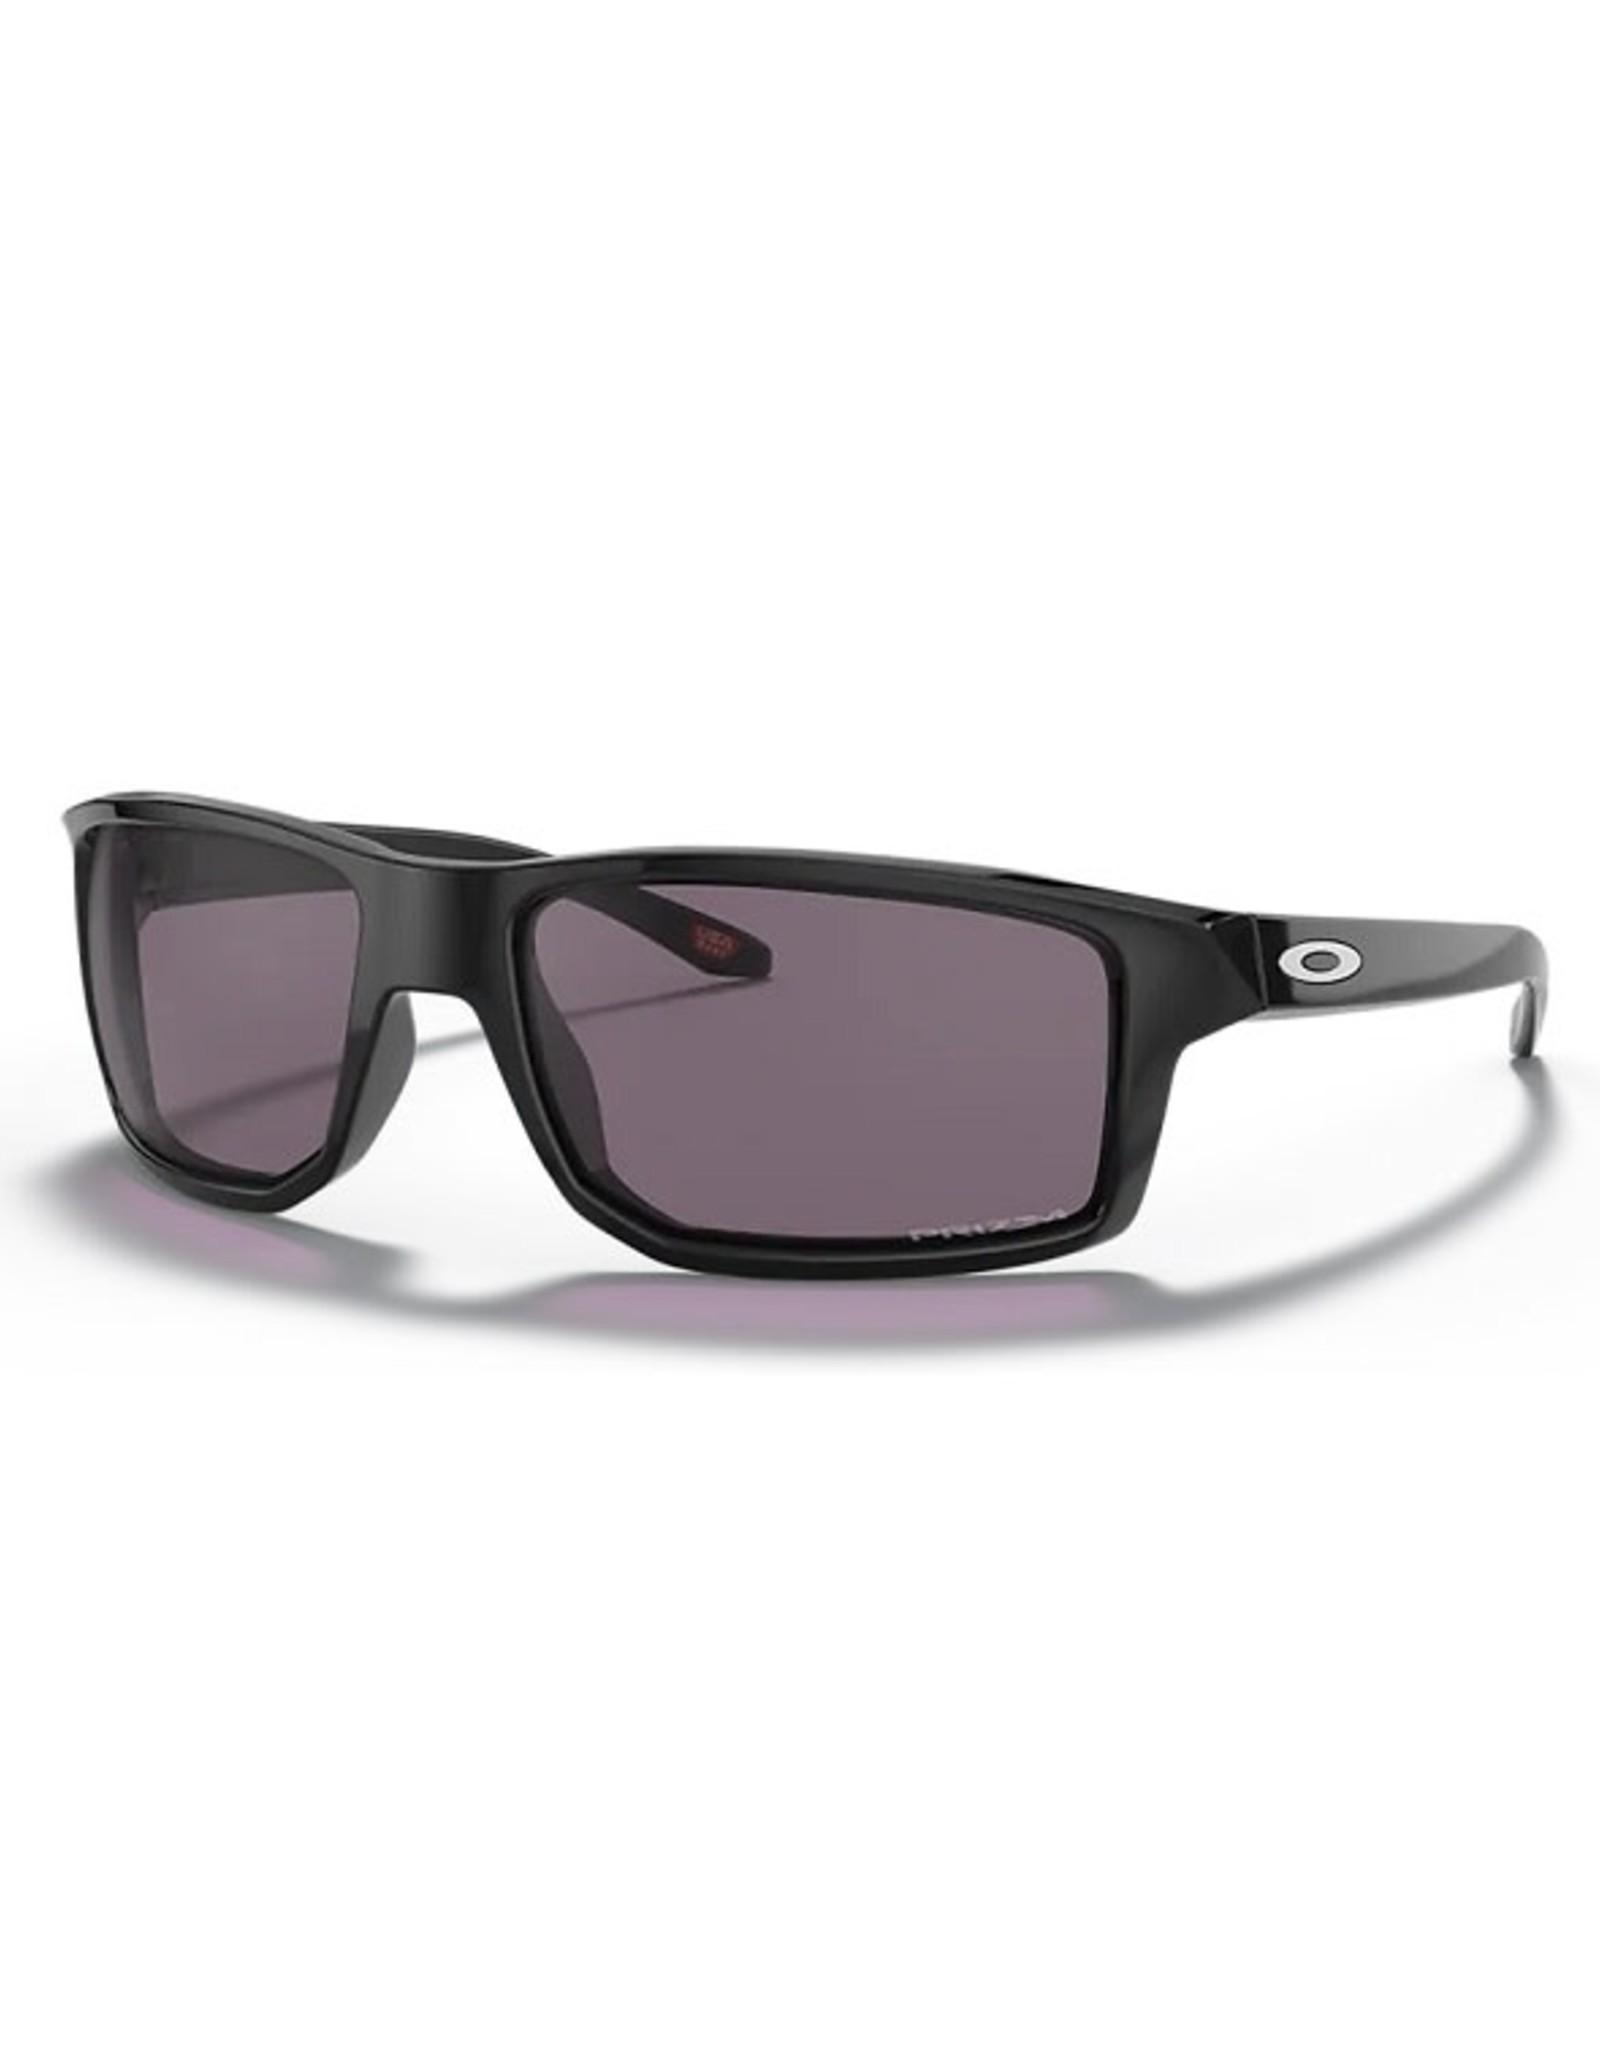 Oakley GIBSTON Polished Black, Prizm Grey